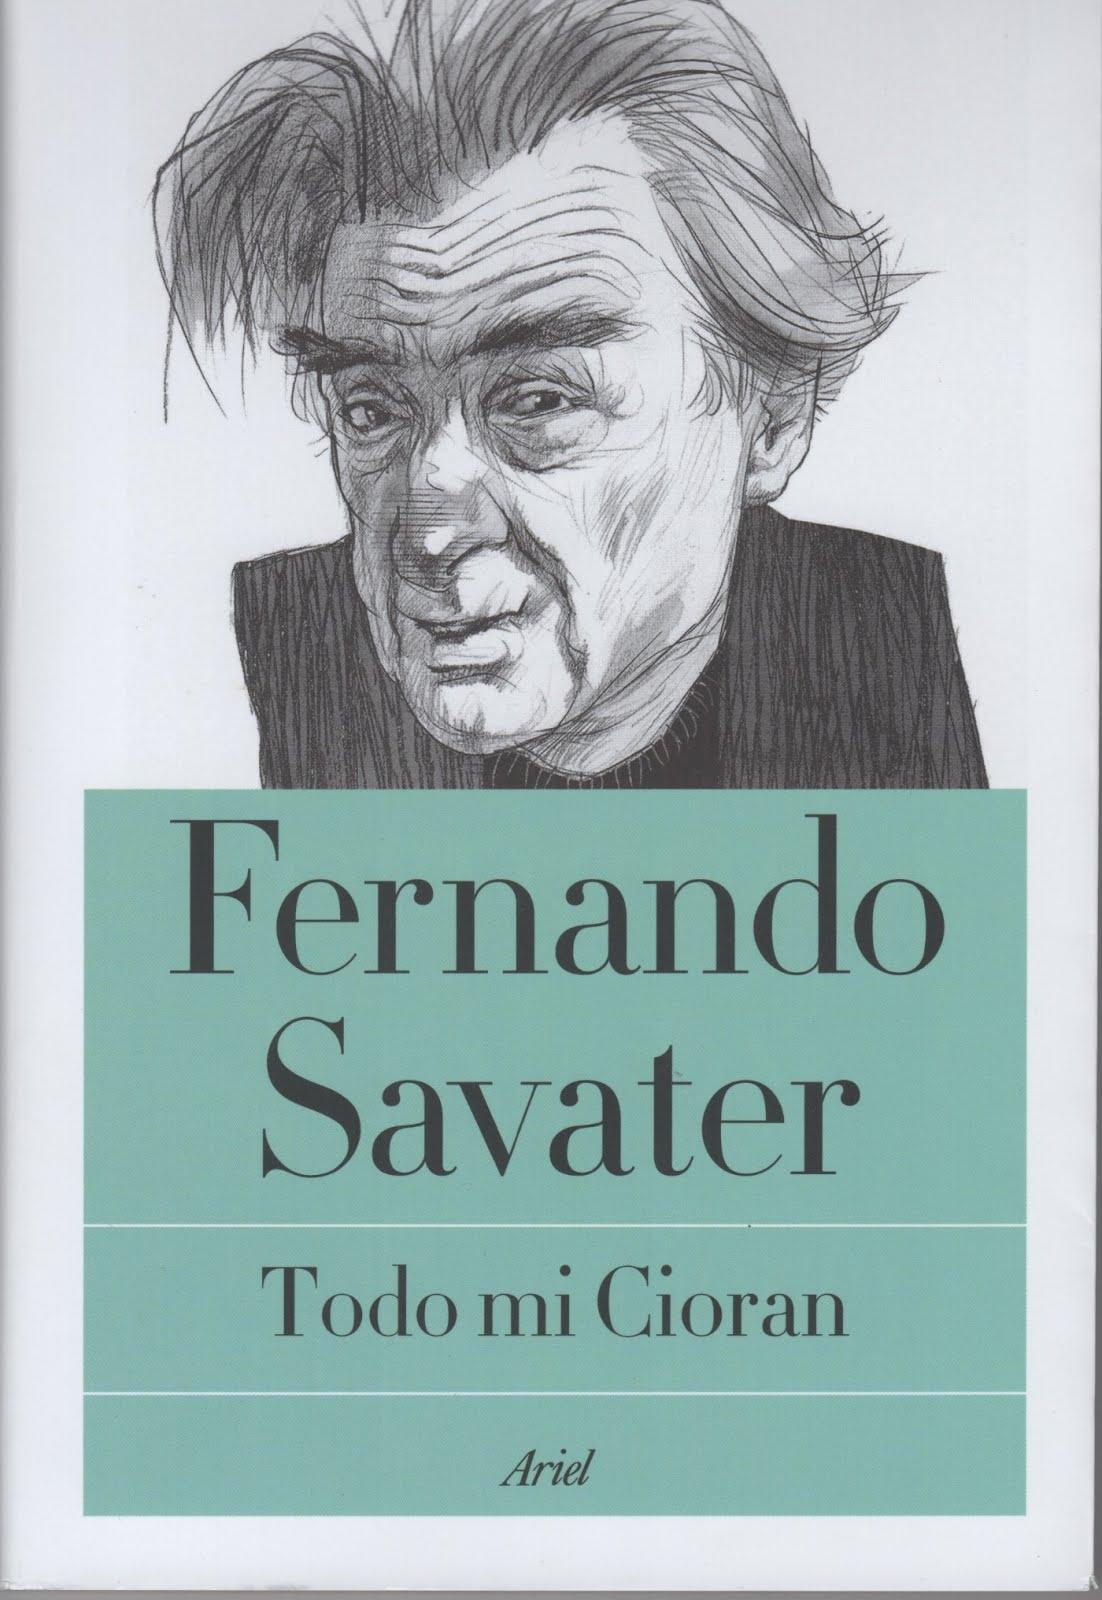 Fernando Savater (Todo mi Cioran)